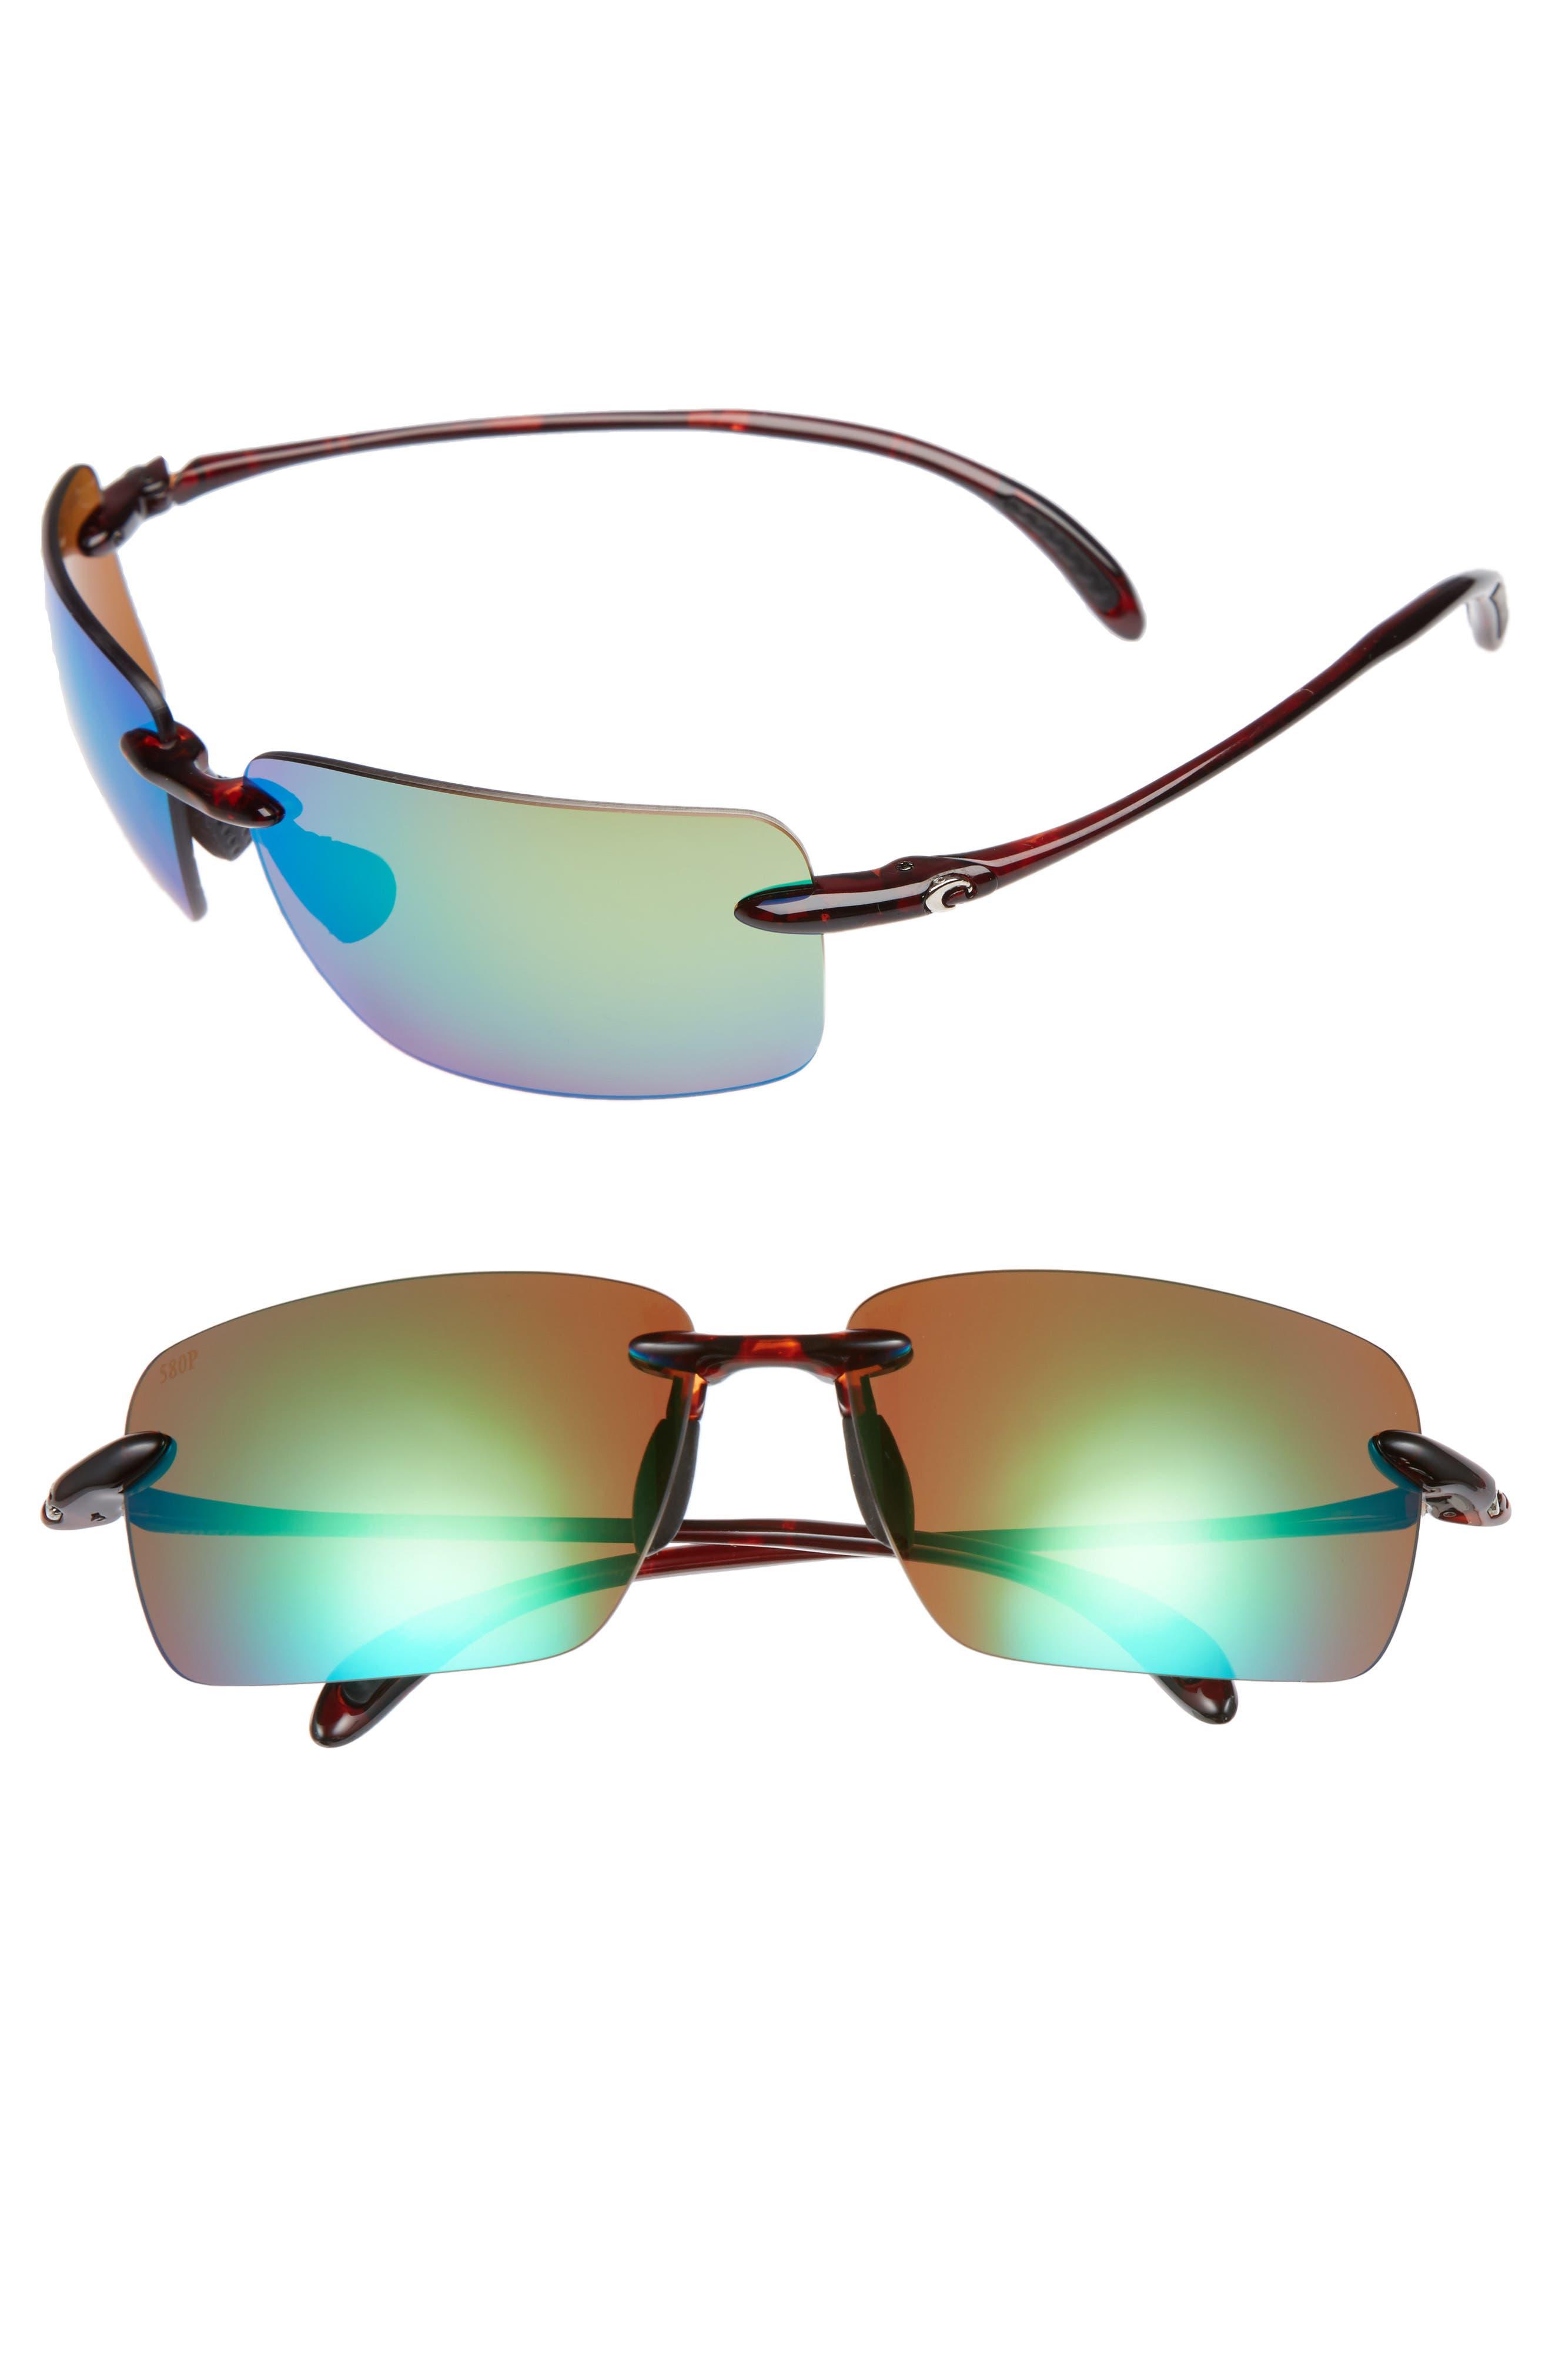 Gulfshore Xl 66mm Polarized Sunglasses